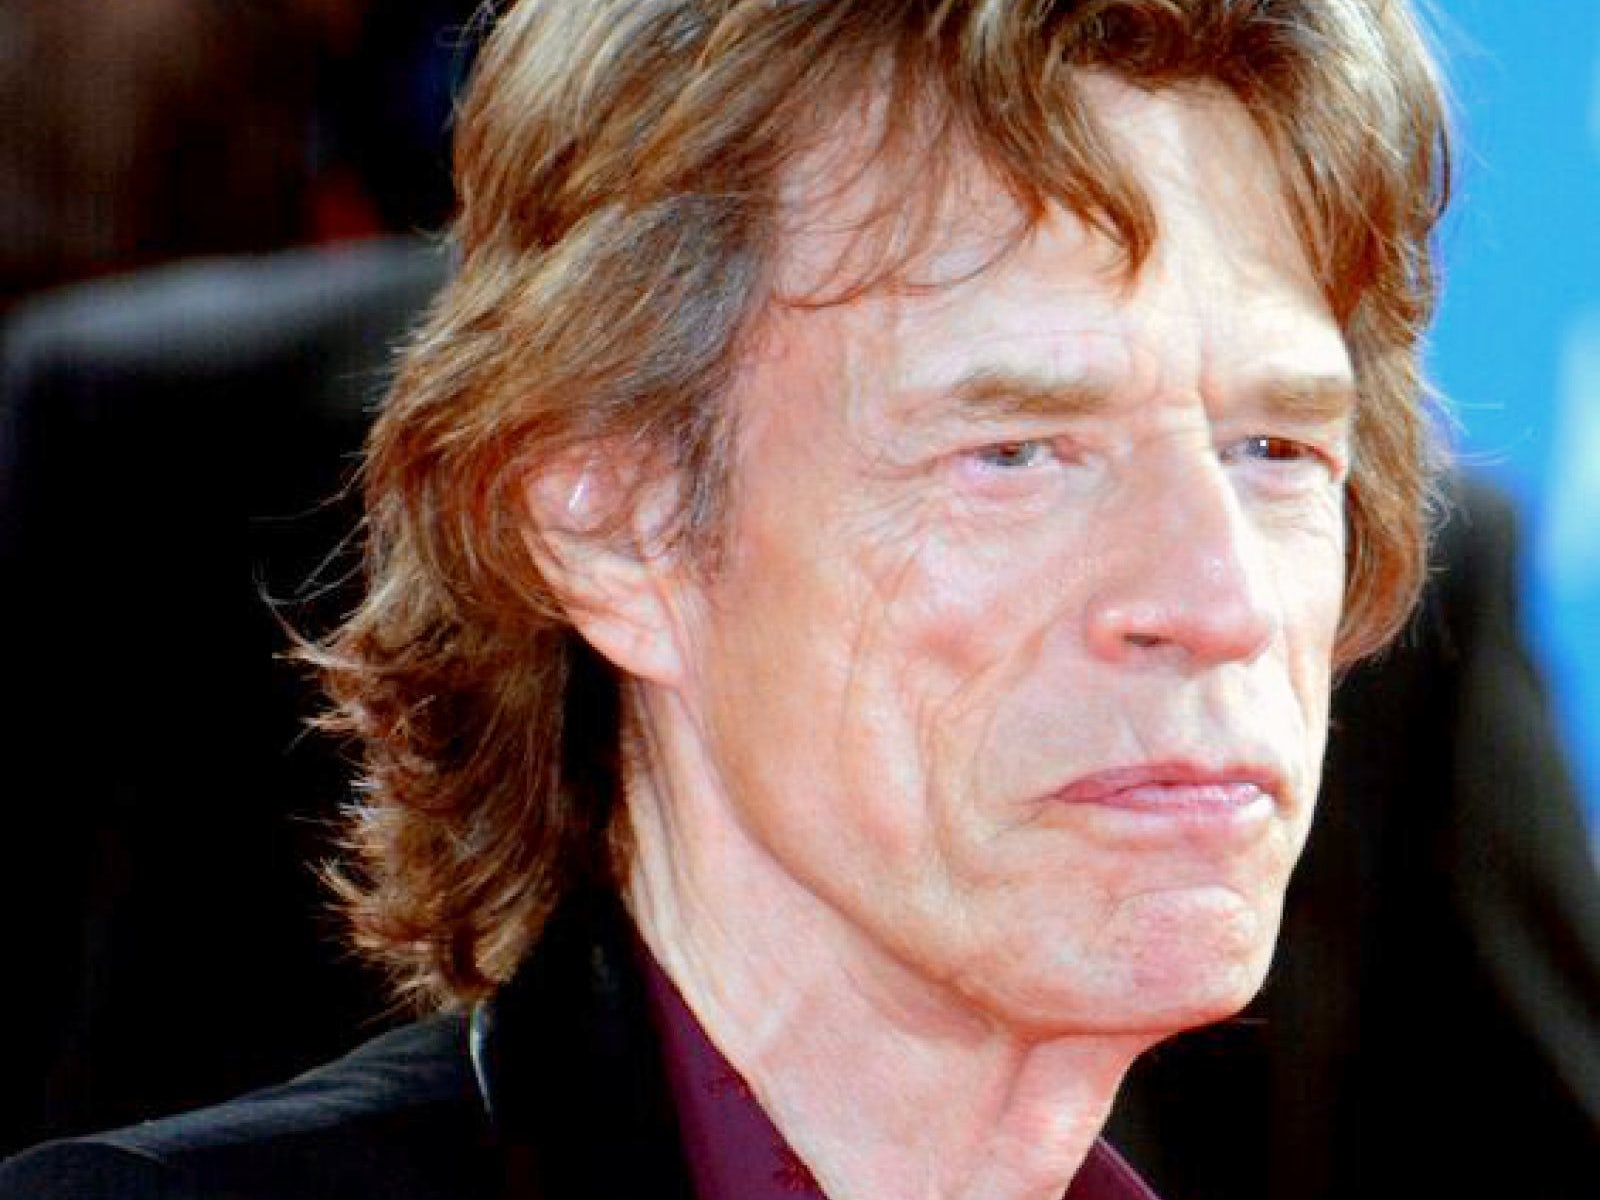 Mick Jagger's daughter weds DJ - Reality TV World